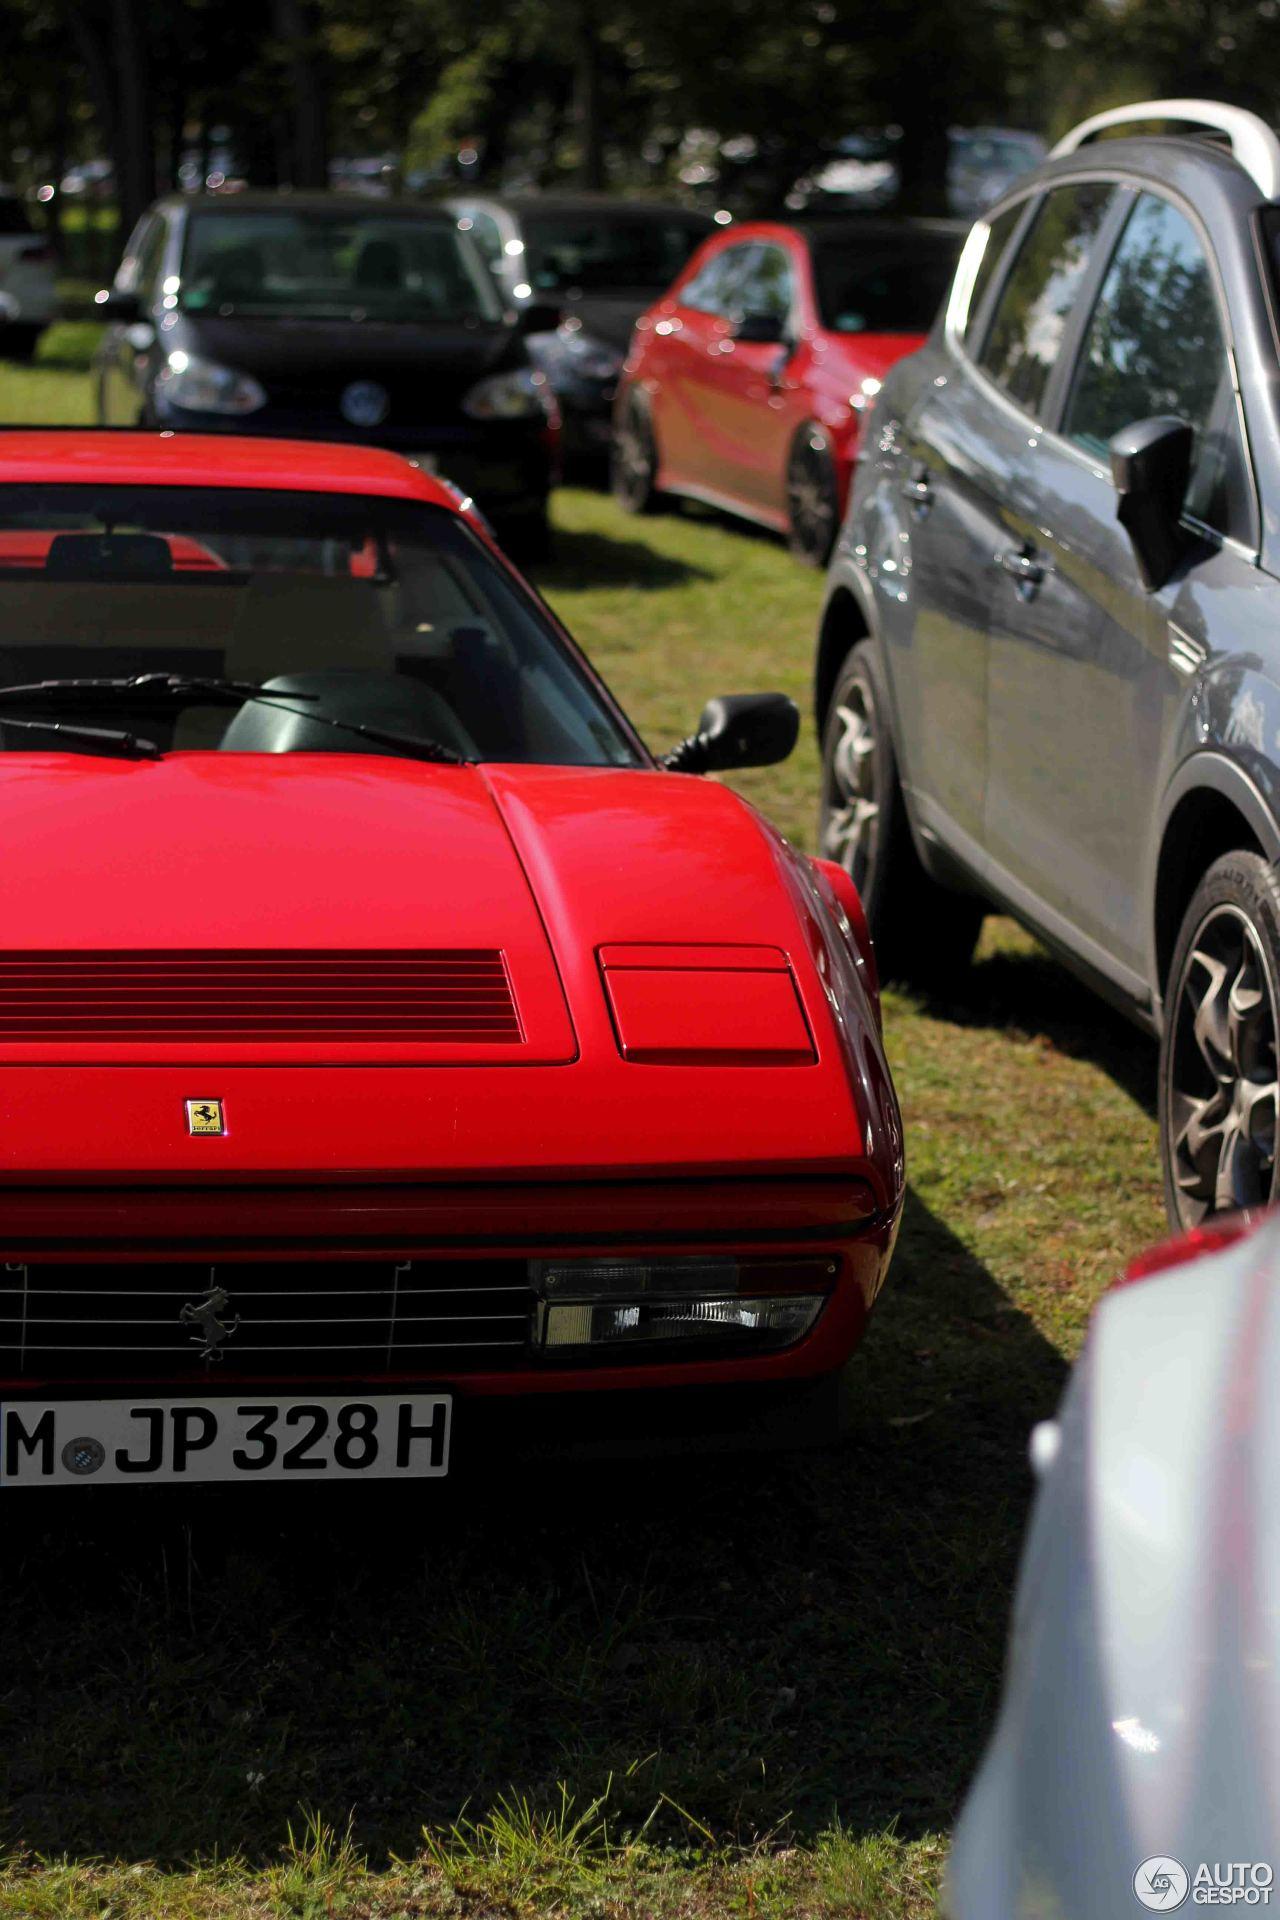 ferrari-328-gtb-c487918092017203136_5 Outstanding Ferrari Mondial 8 Sale south Africa Cars Trend